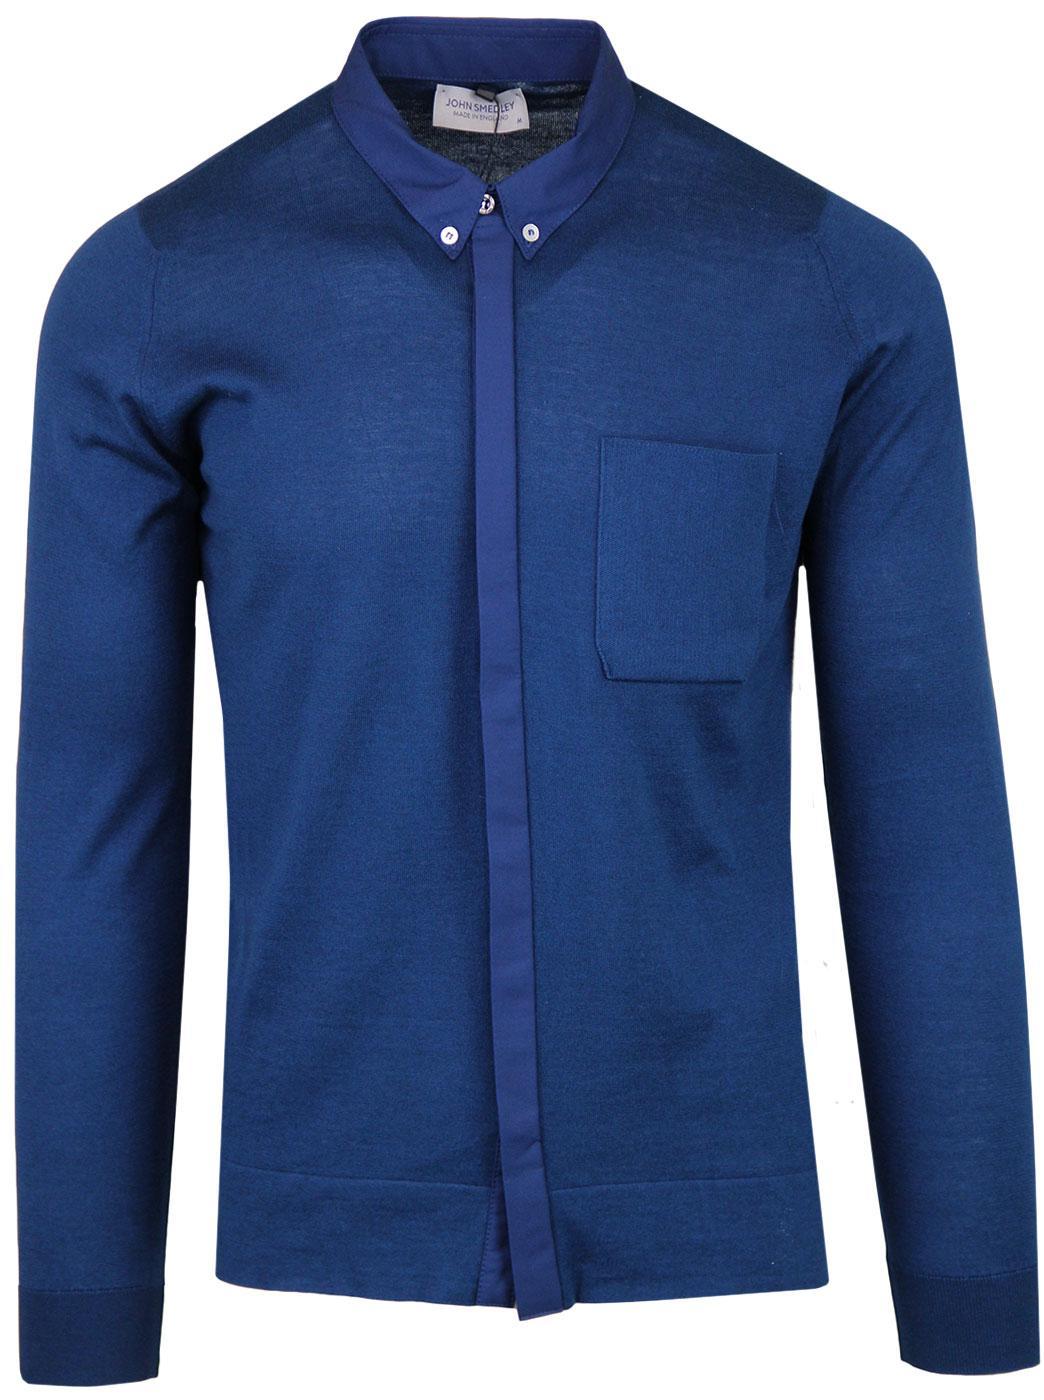 Banwell JOHN SMEDLEY 60s Mod Knitted Pocket Shirt